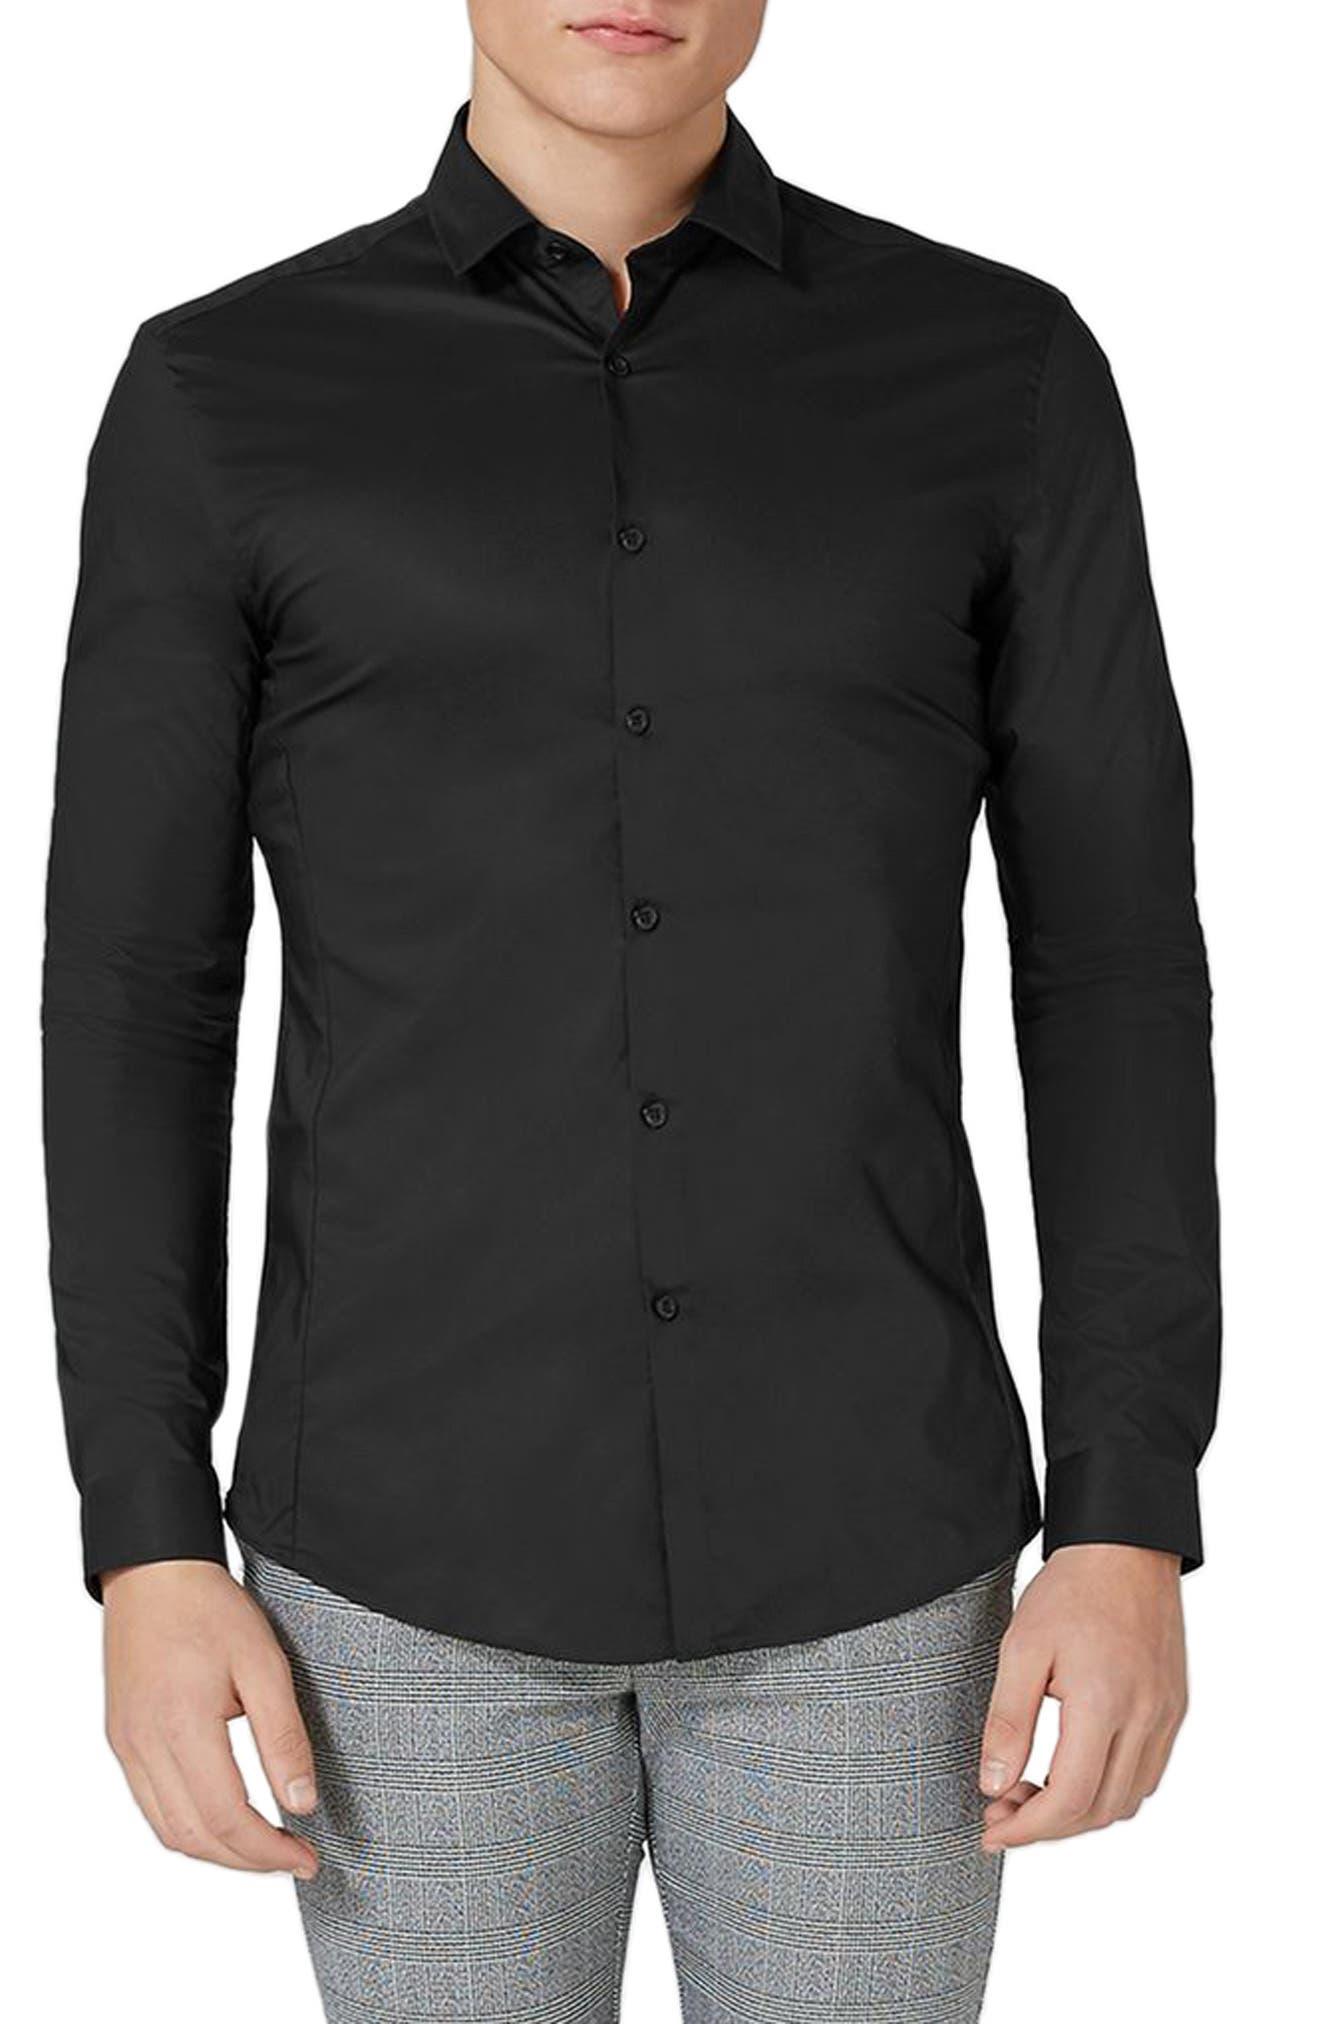 Alternate Image 1 Selected - Topman Muscle Fit Stretch Poplin Shirt